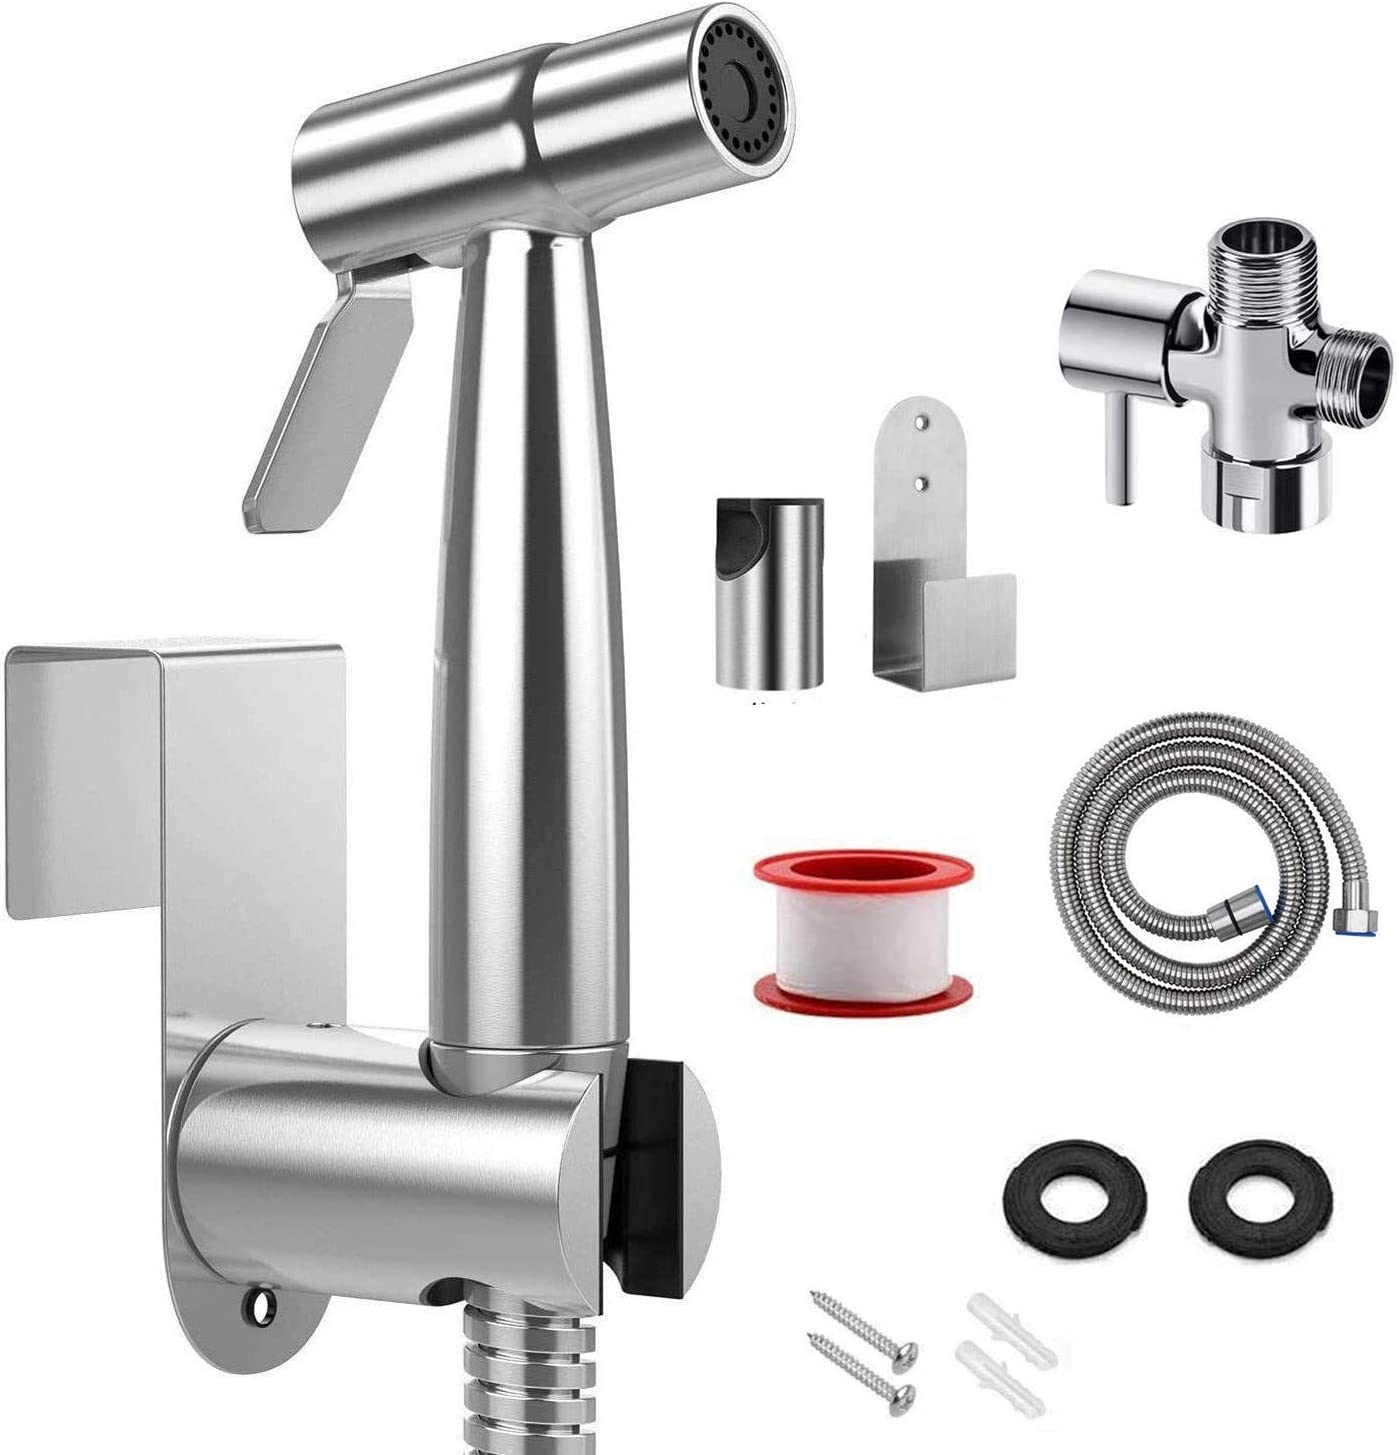 Hatos handheld Japan Maker New bidet sprayer for Bidet toilet kit M Tampa Mall